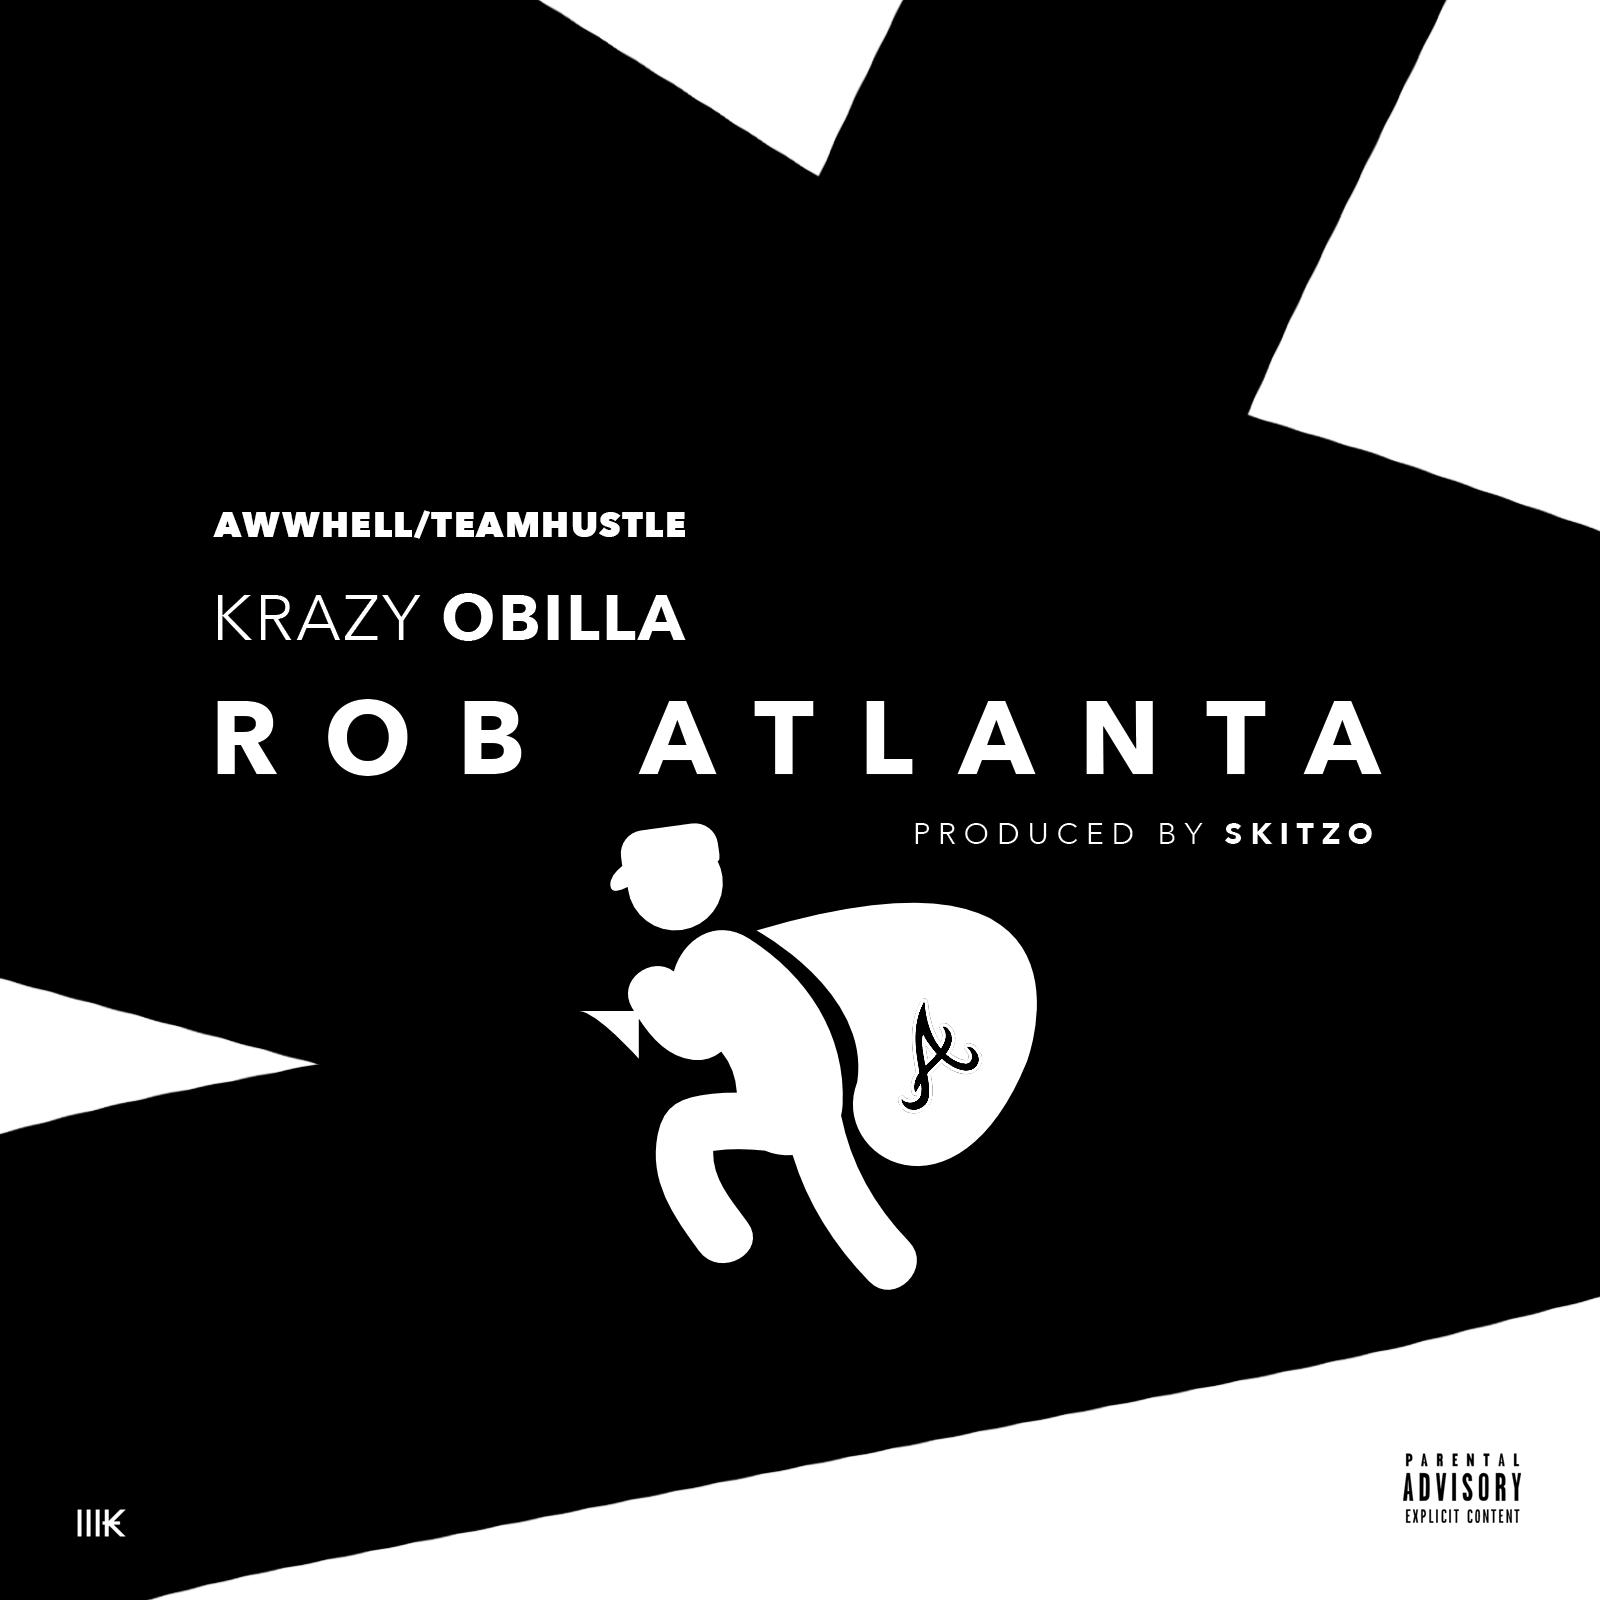 New Music: Krazy Obilla – Rob Atlanta